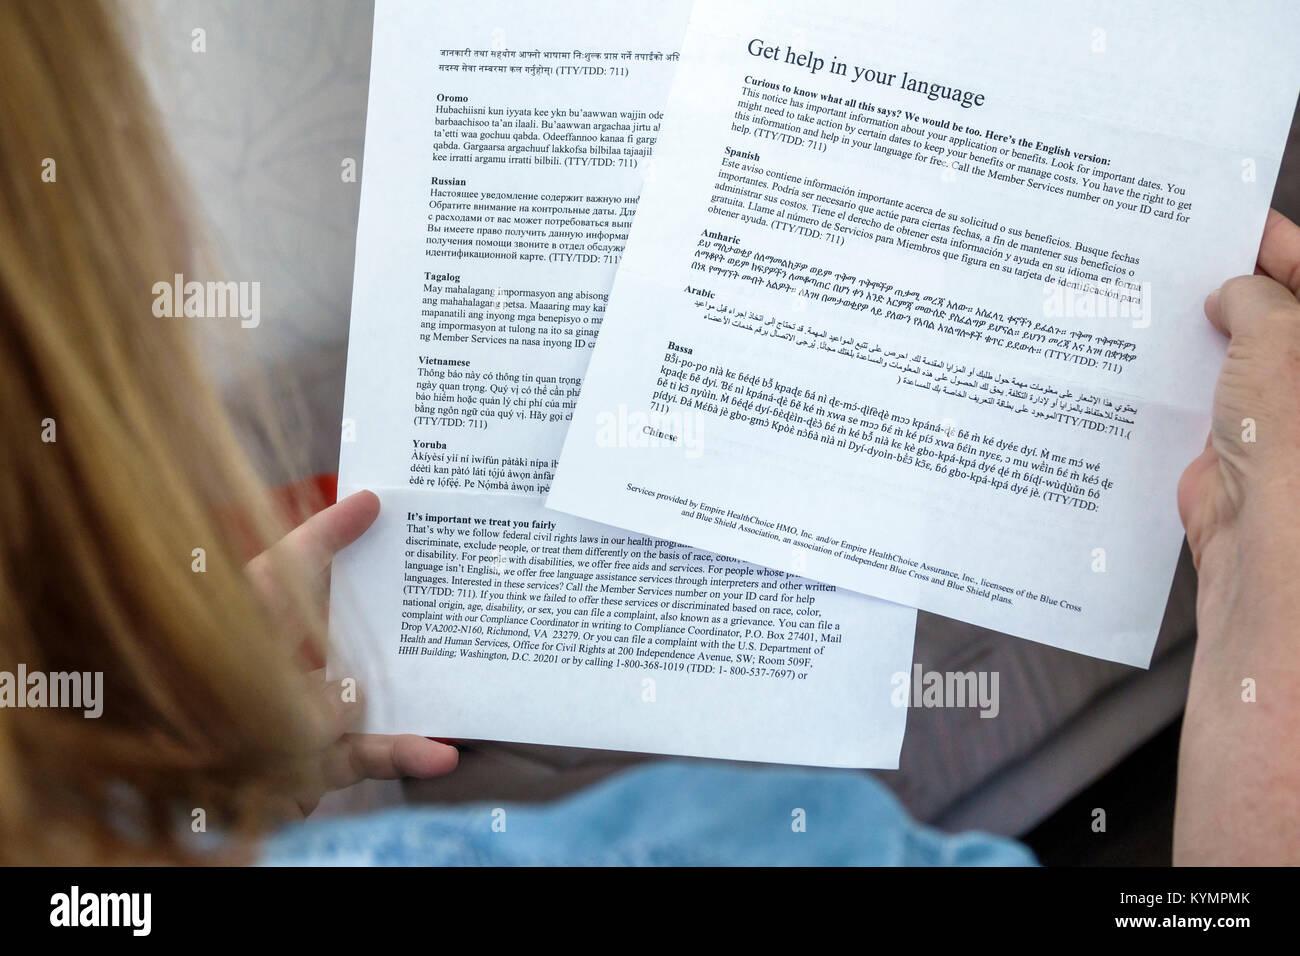 Miami Beach Florida policy documents insurance Empire HealthChoice HMO medical multilingual languages English Spanish - Stock Image